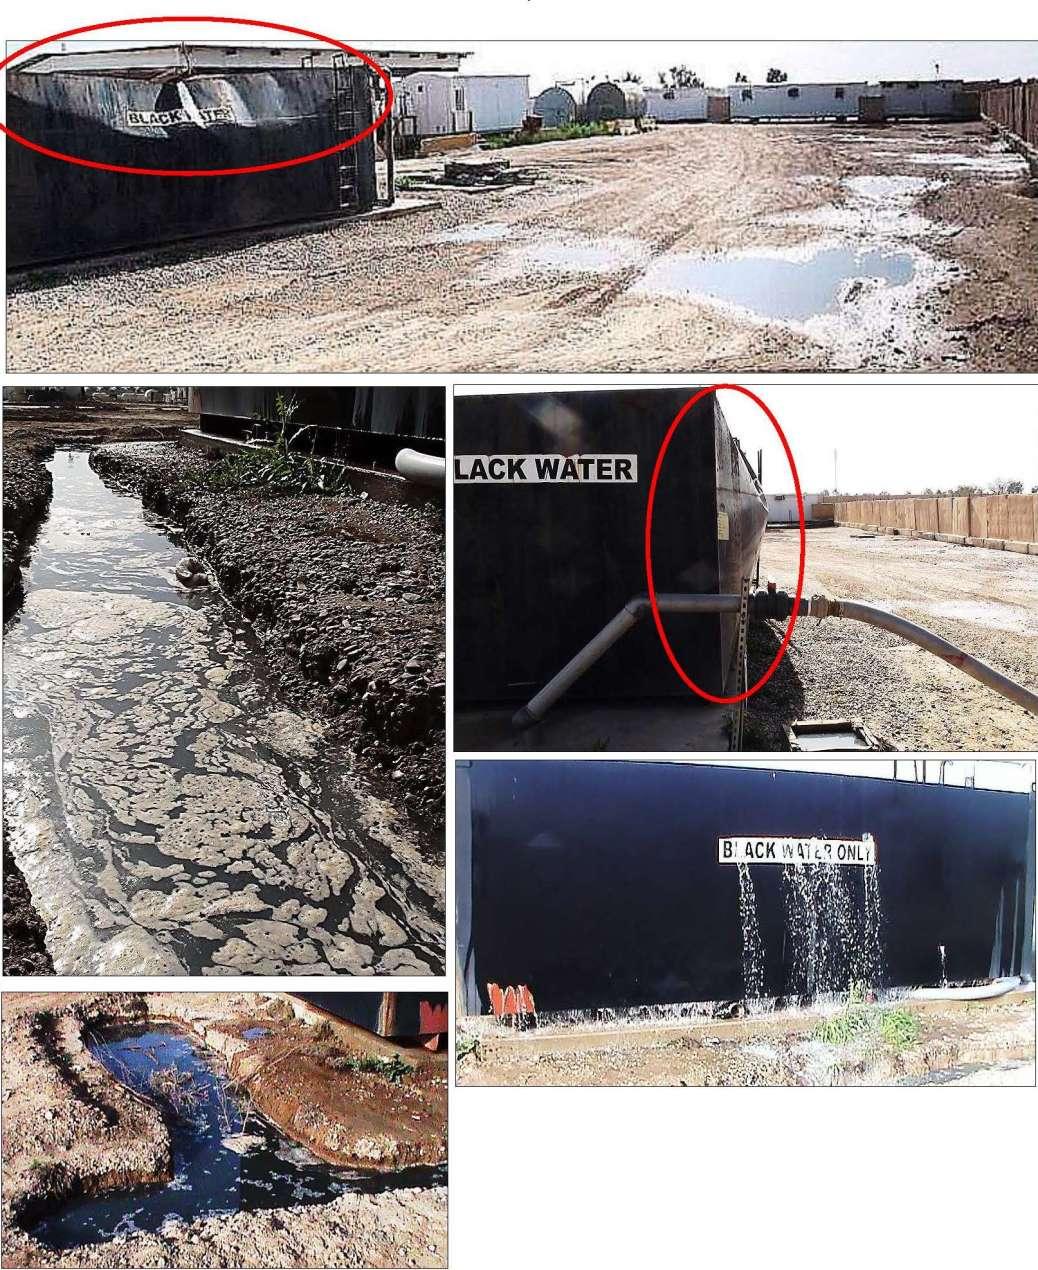 Camp Liberty sewage crisis